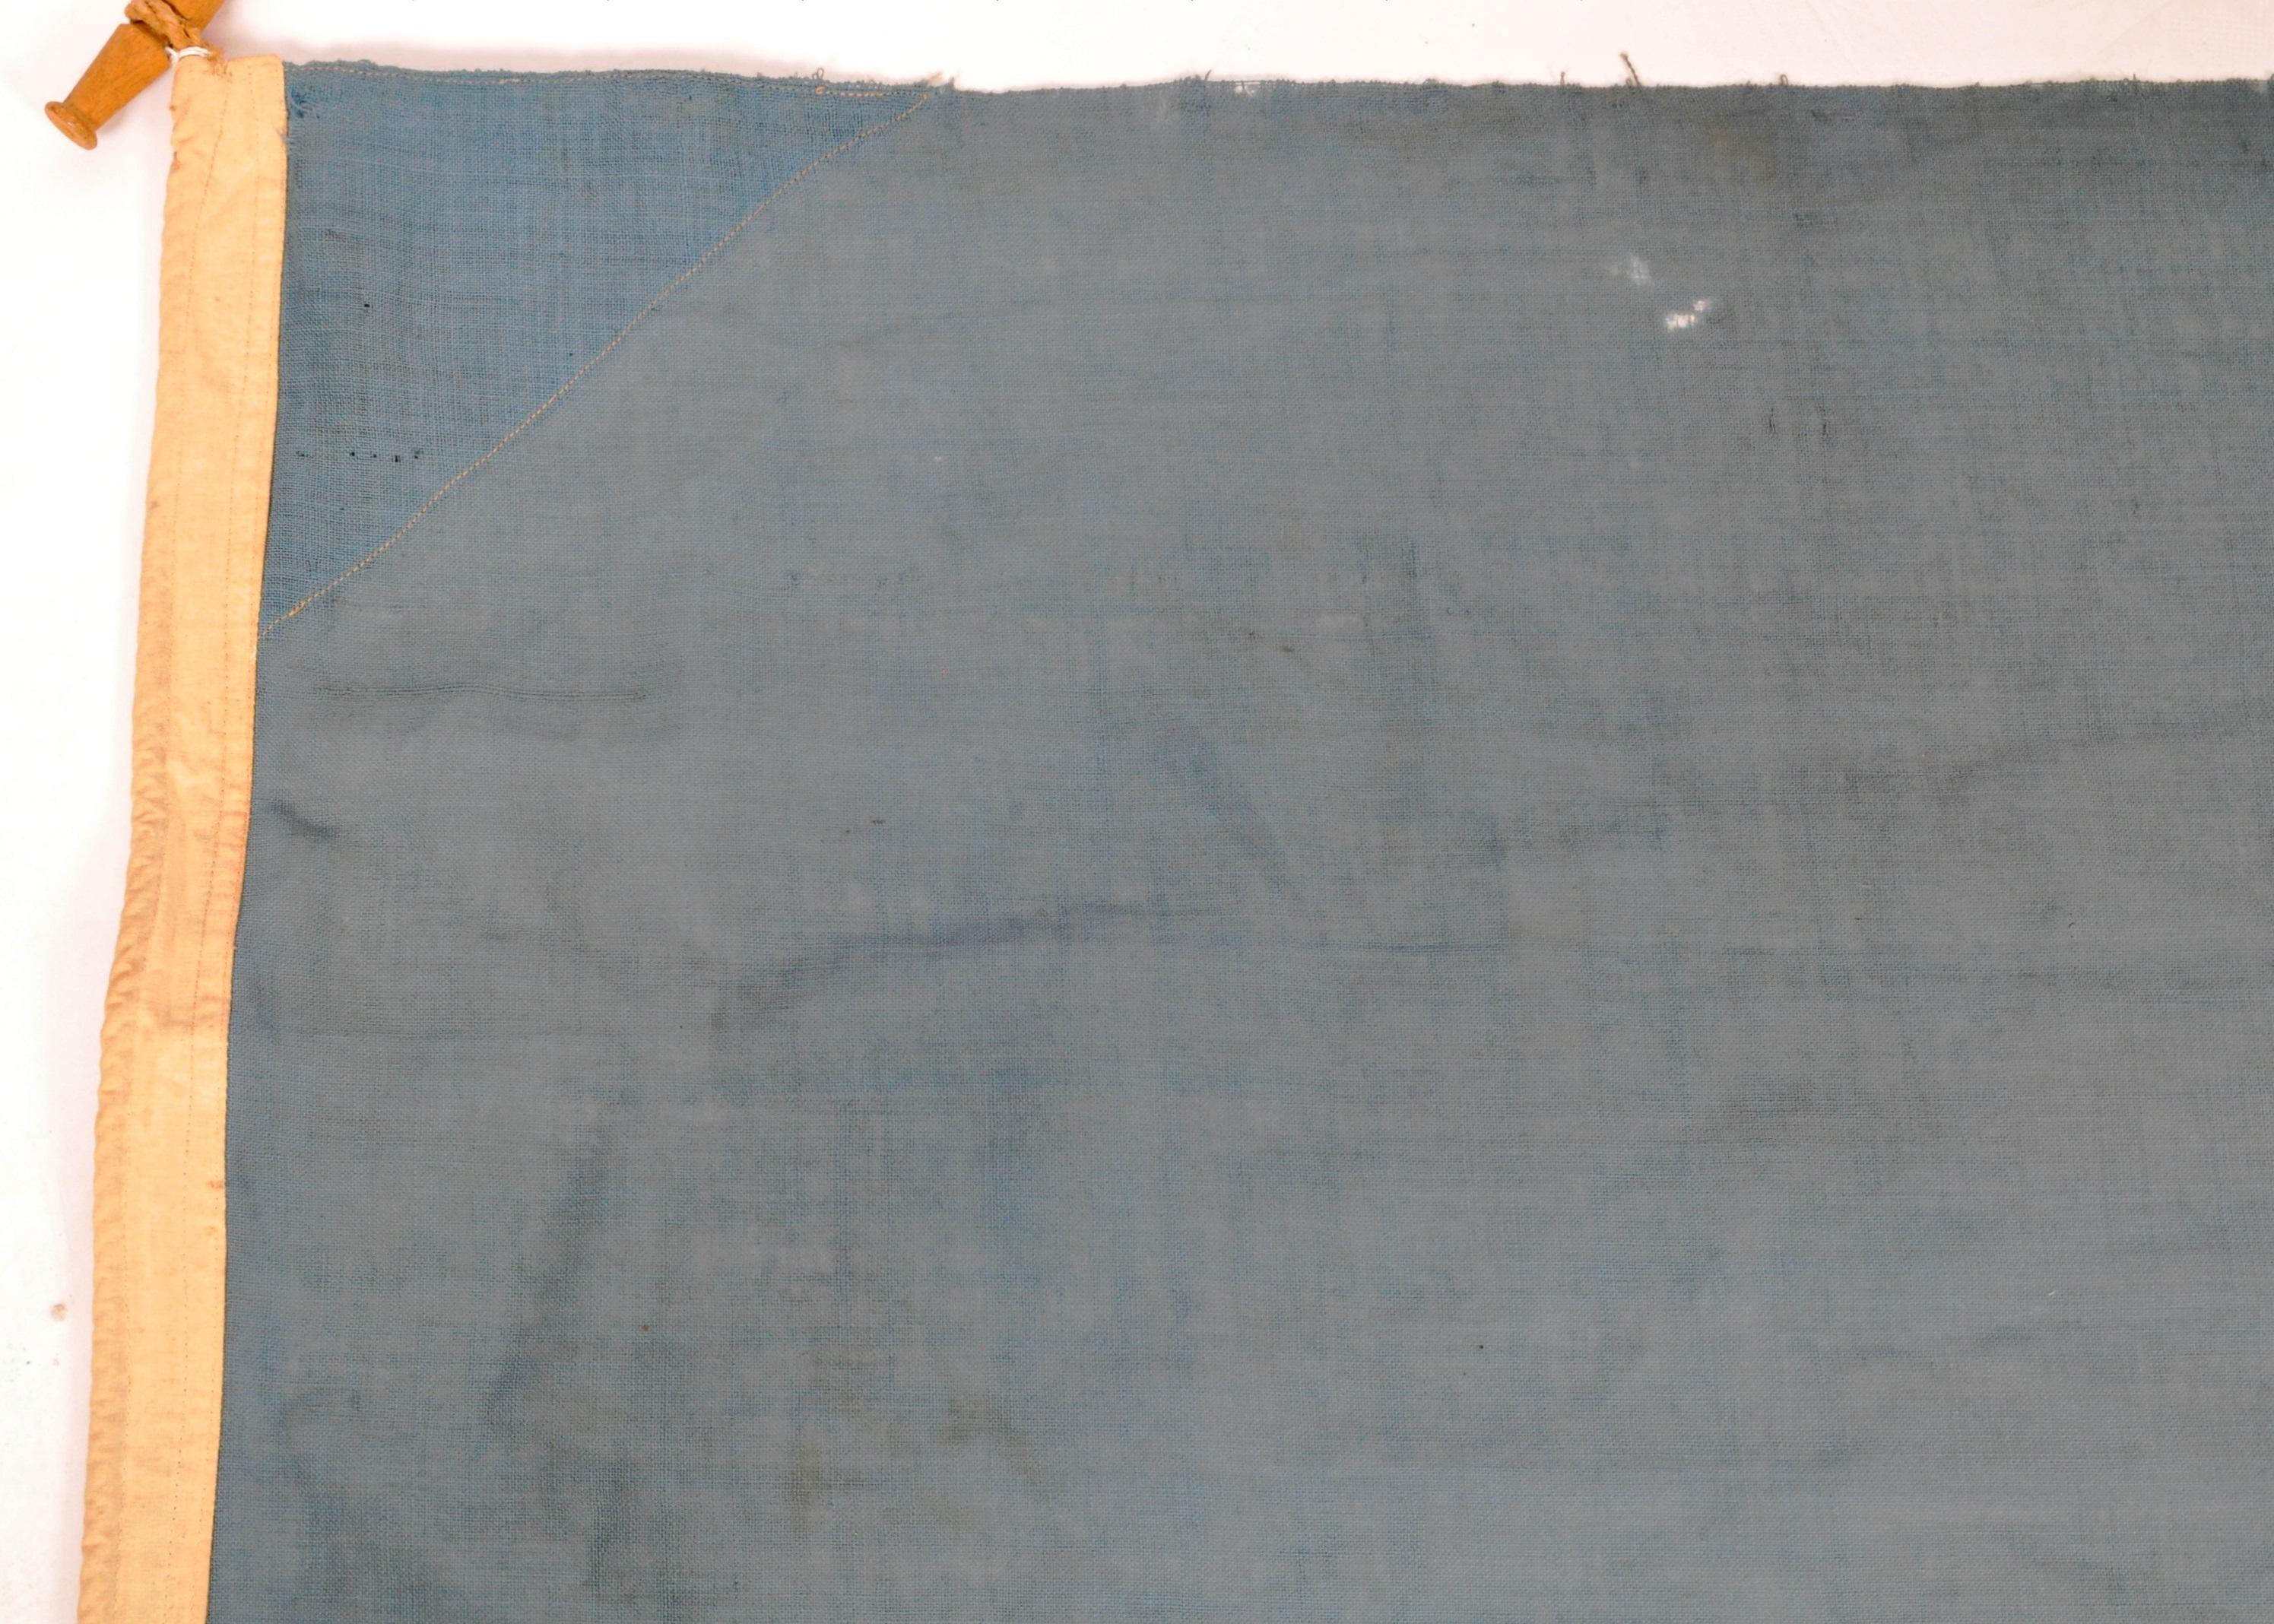 VINTAGE C1950S KOREAN WAR ERA UN UNITED NATIONS FLAG - Image 3 of 6